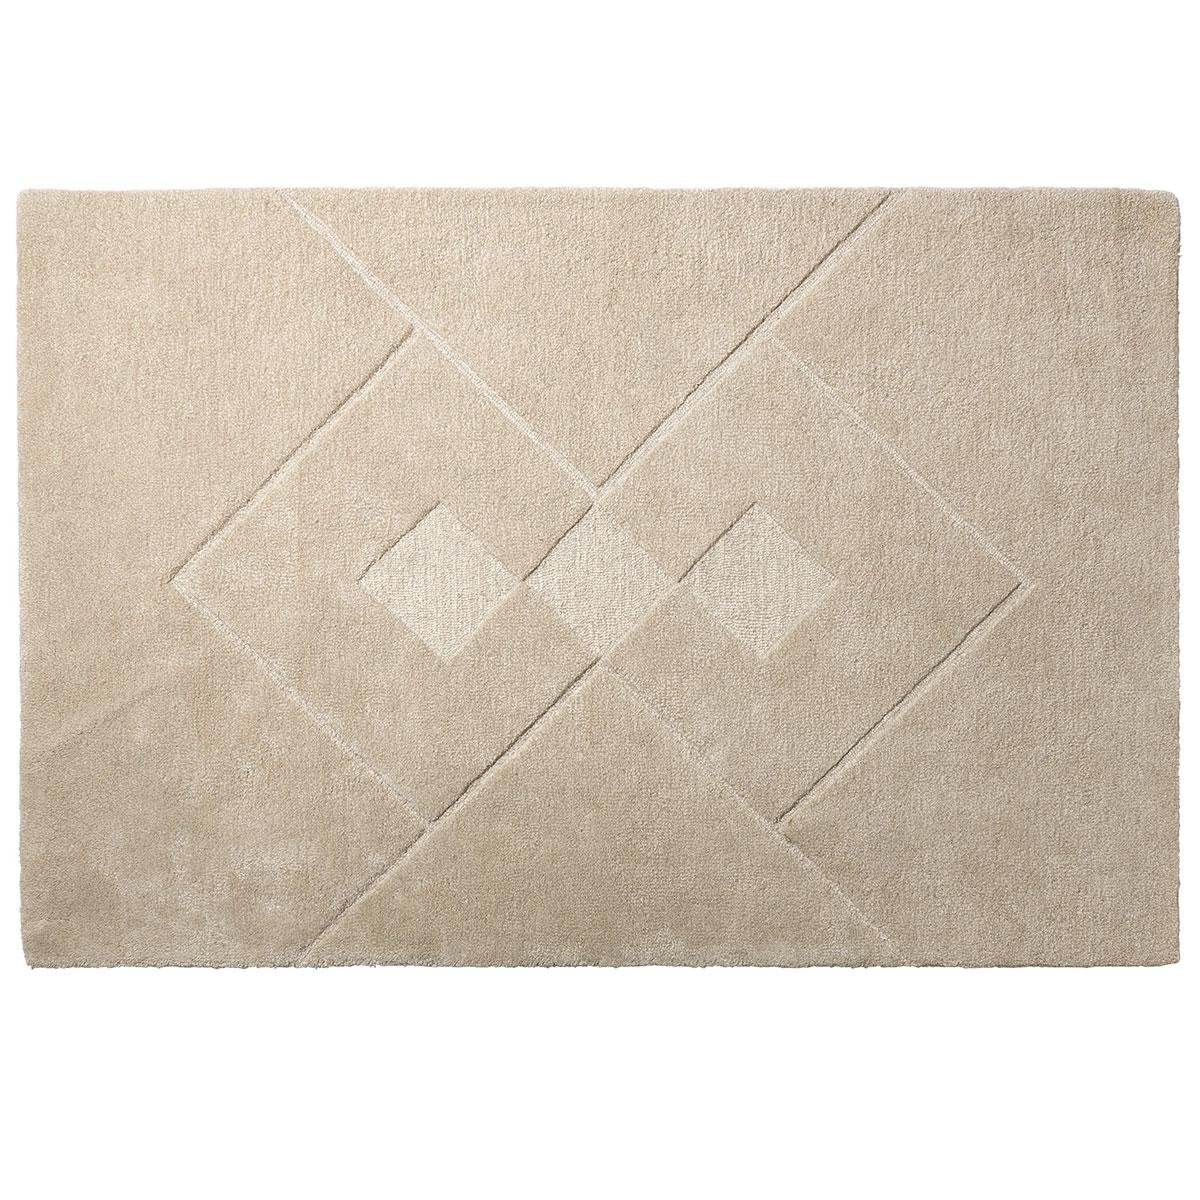 Bettina Juul Eilersen gulvtæppe - R7 Hera - 200 x 300 cm - Sand